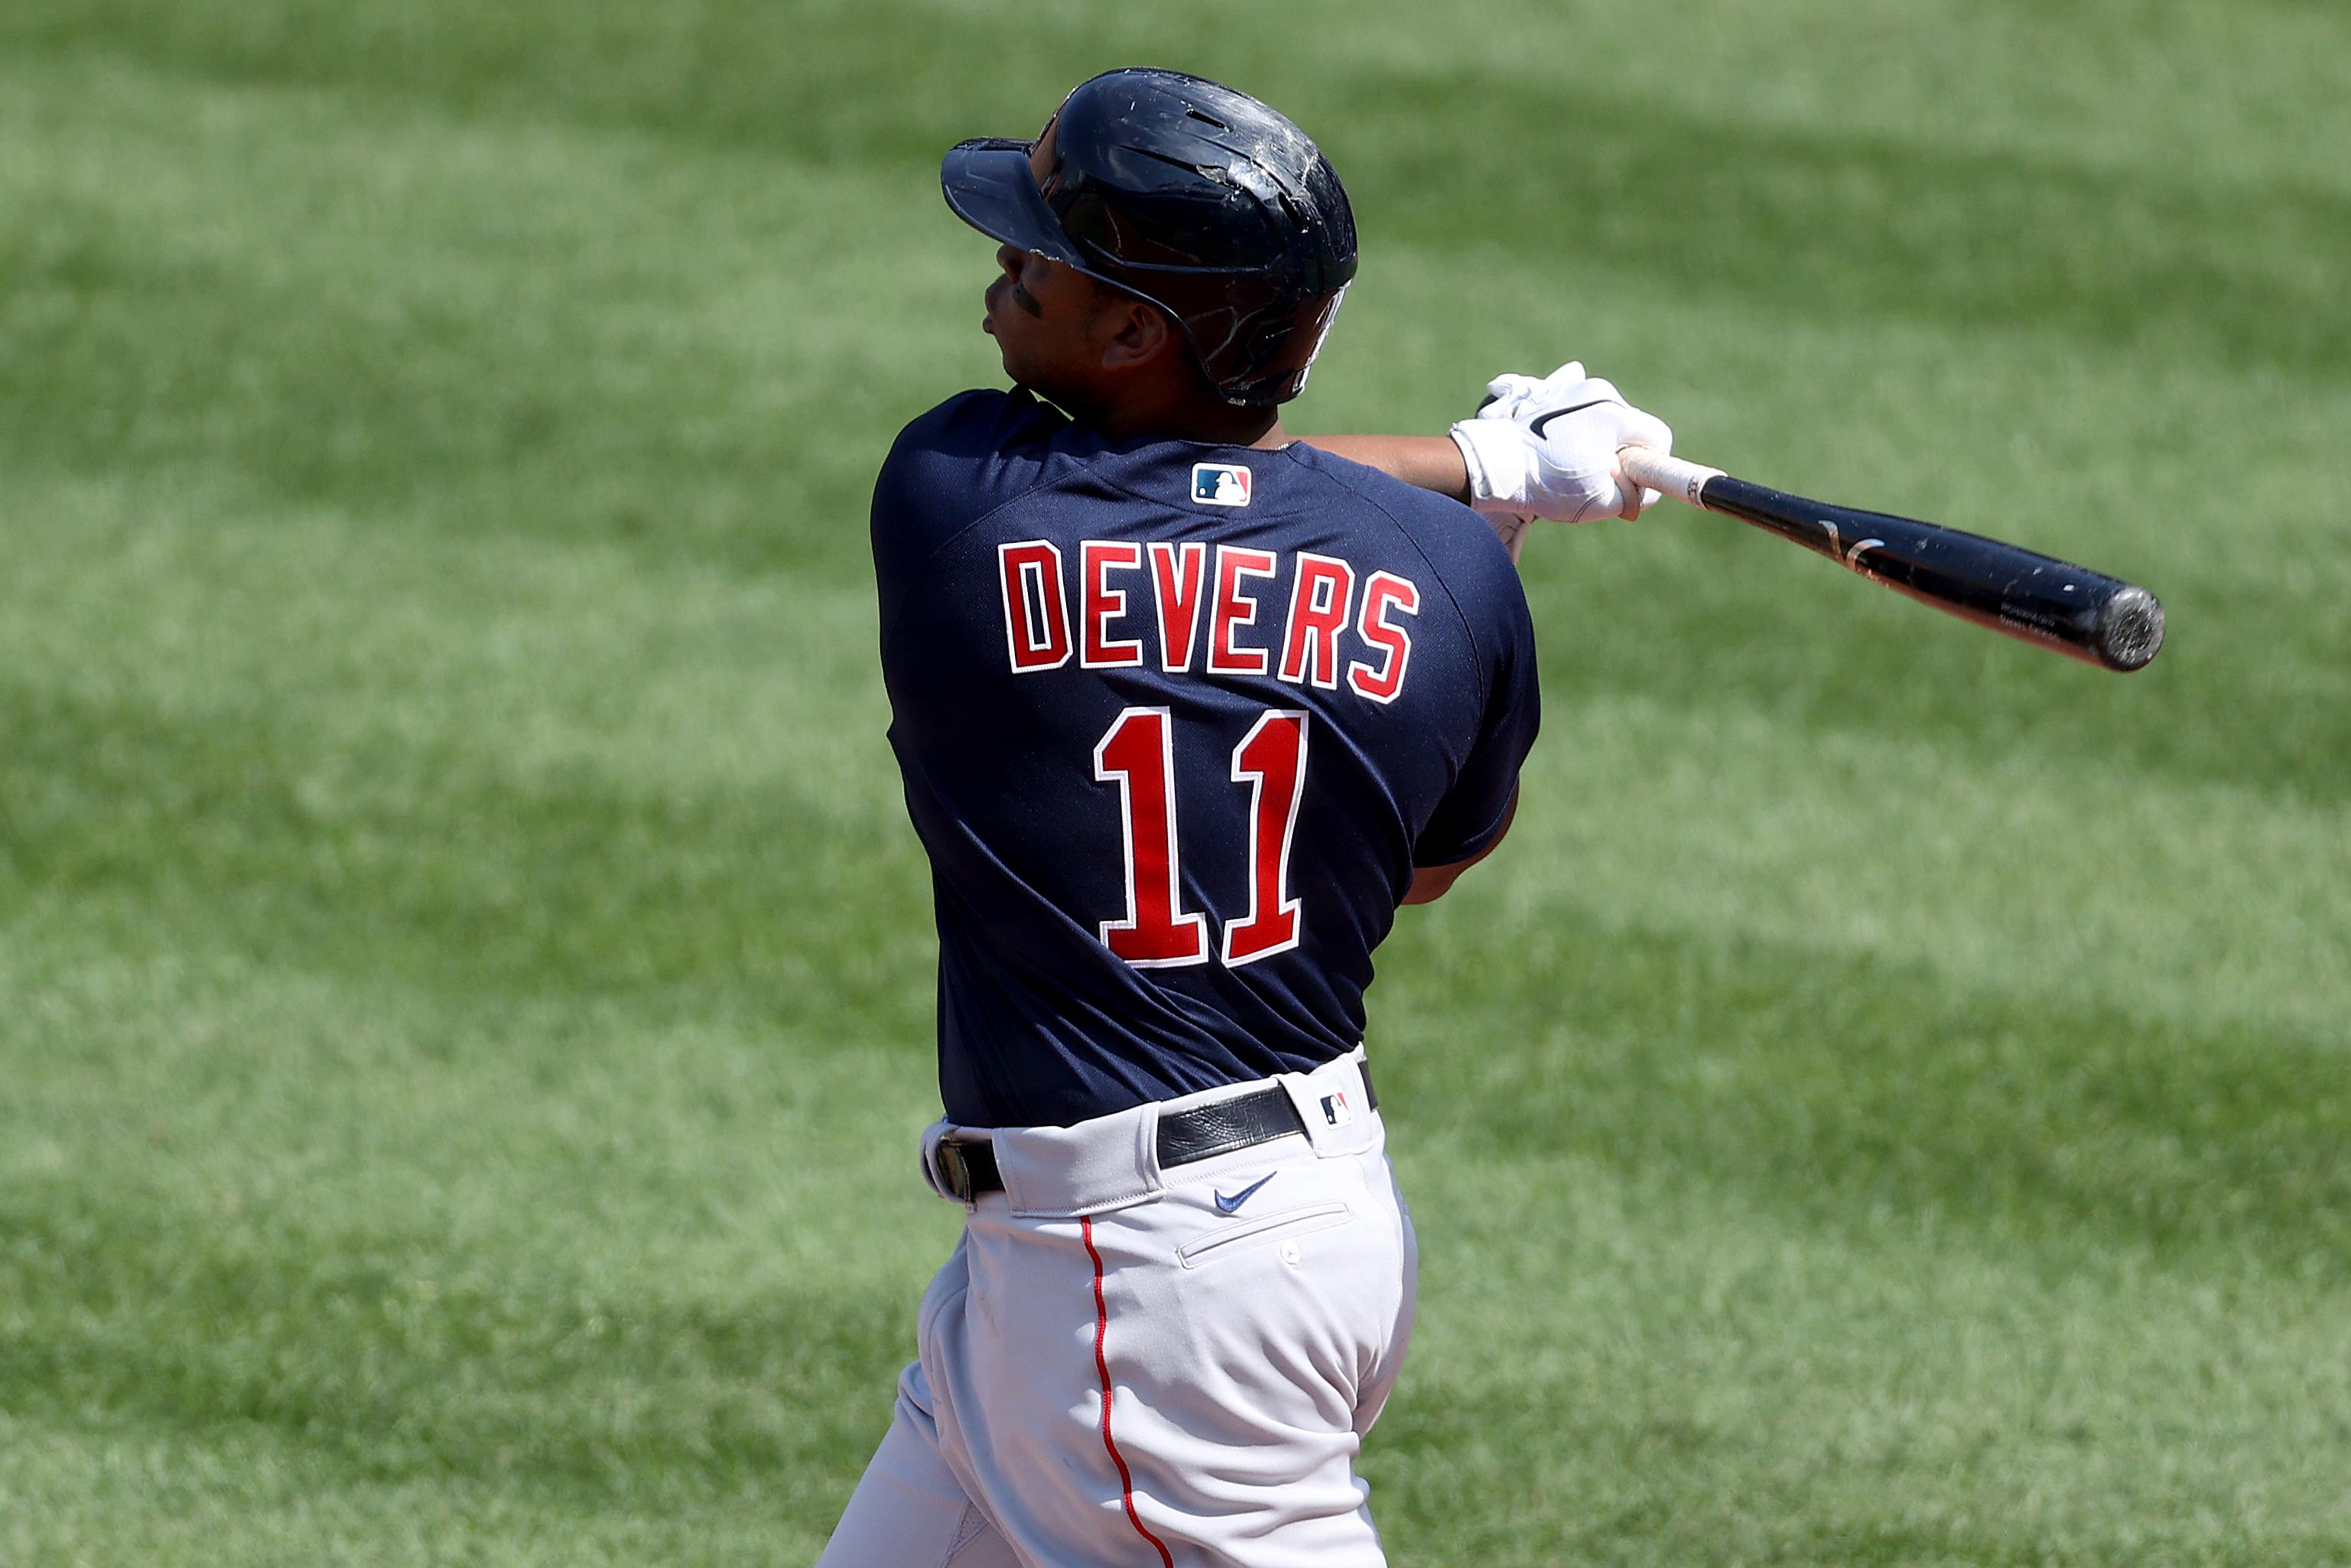 Rafael Devers has made himself feel at home at Camden Yards - The Boston  Globe